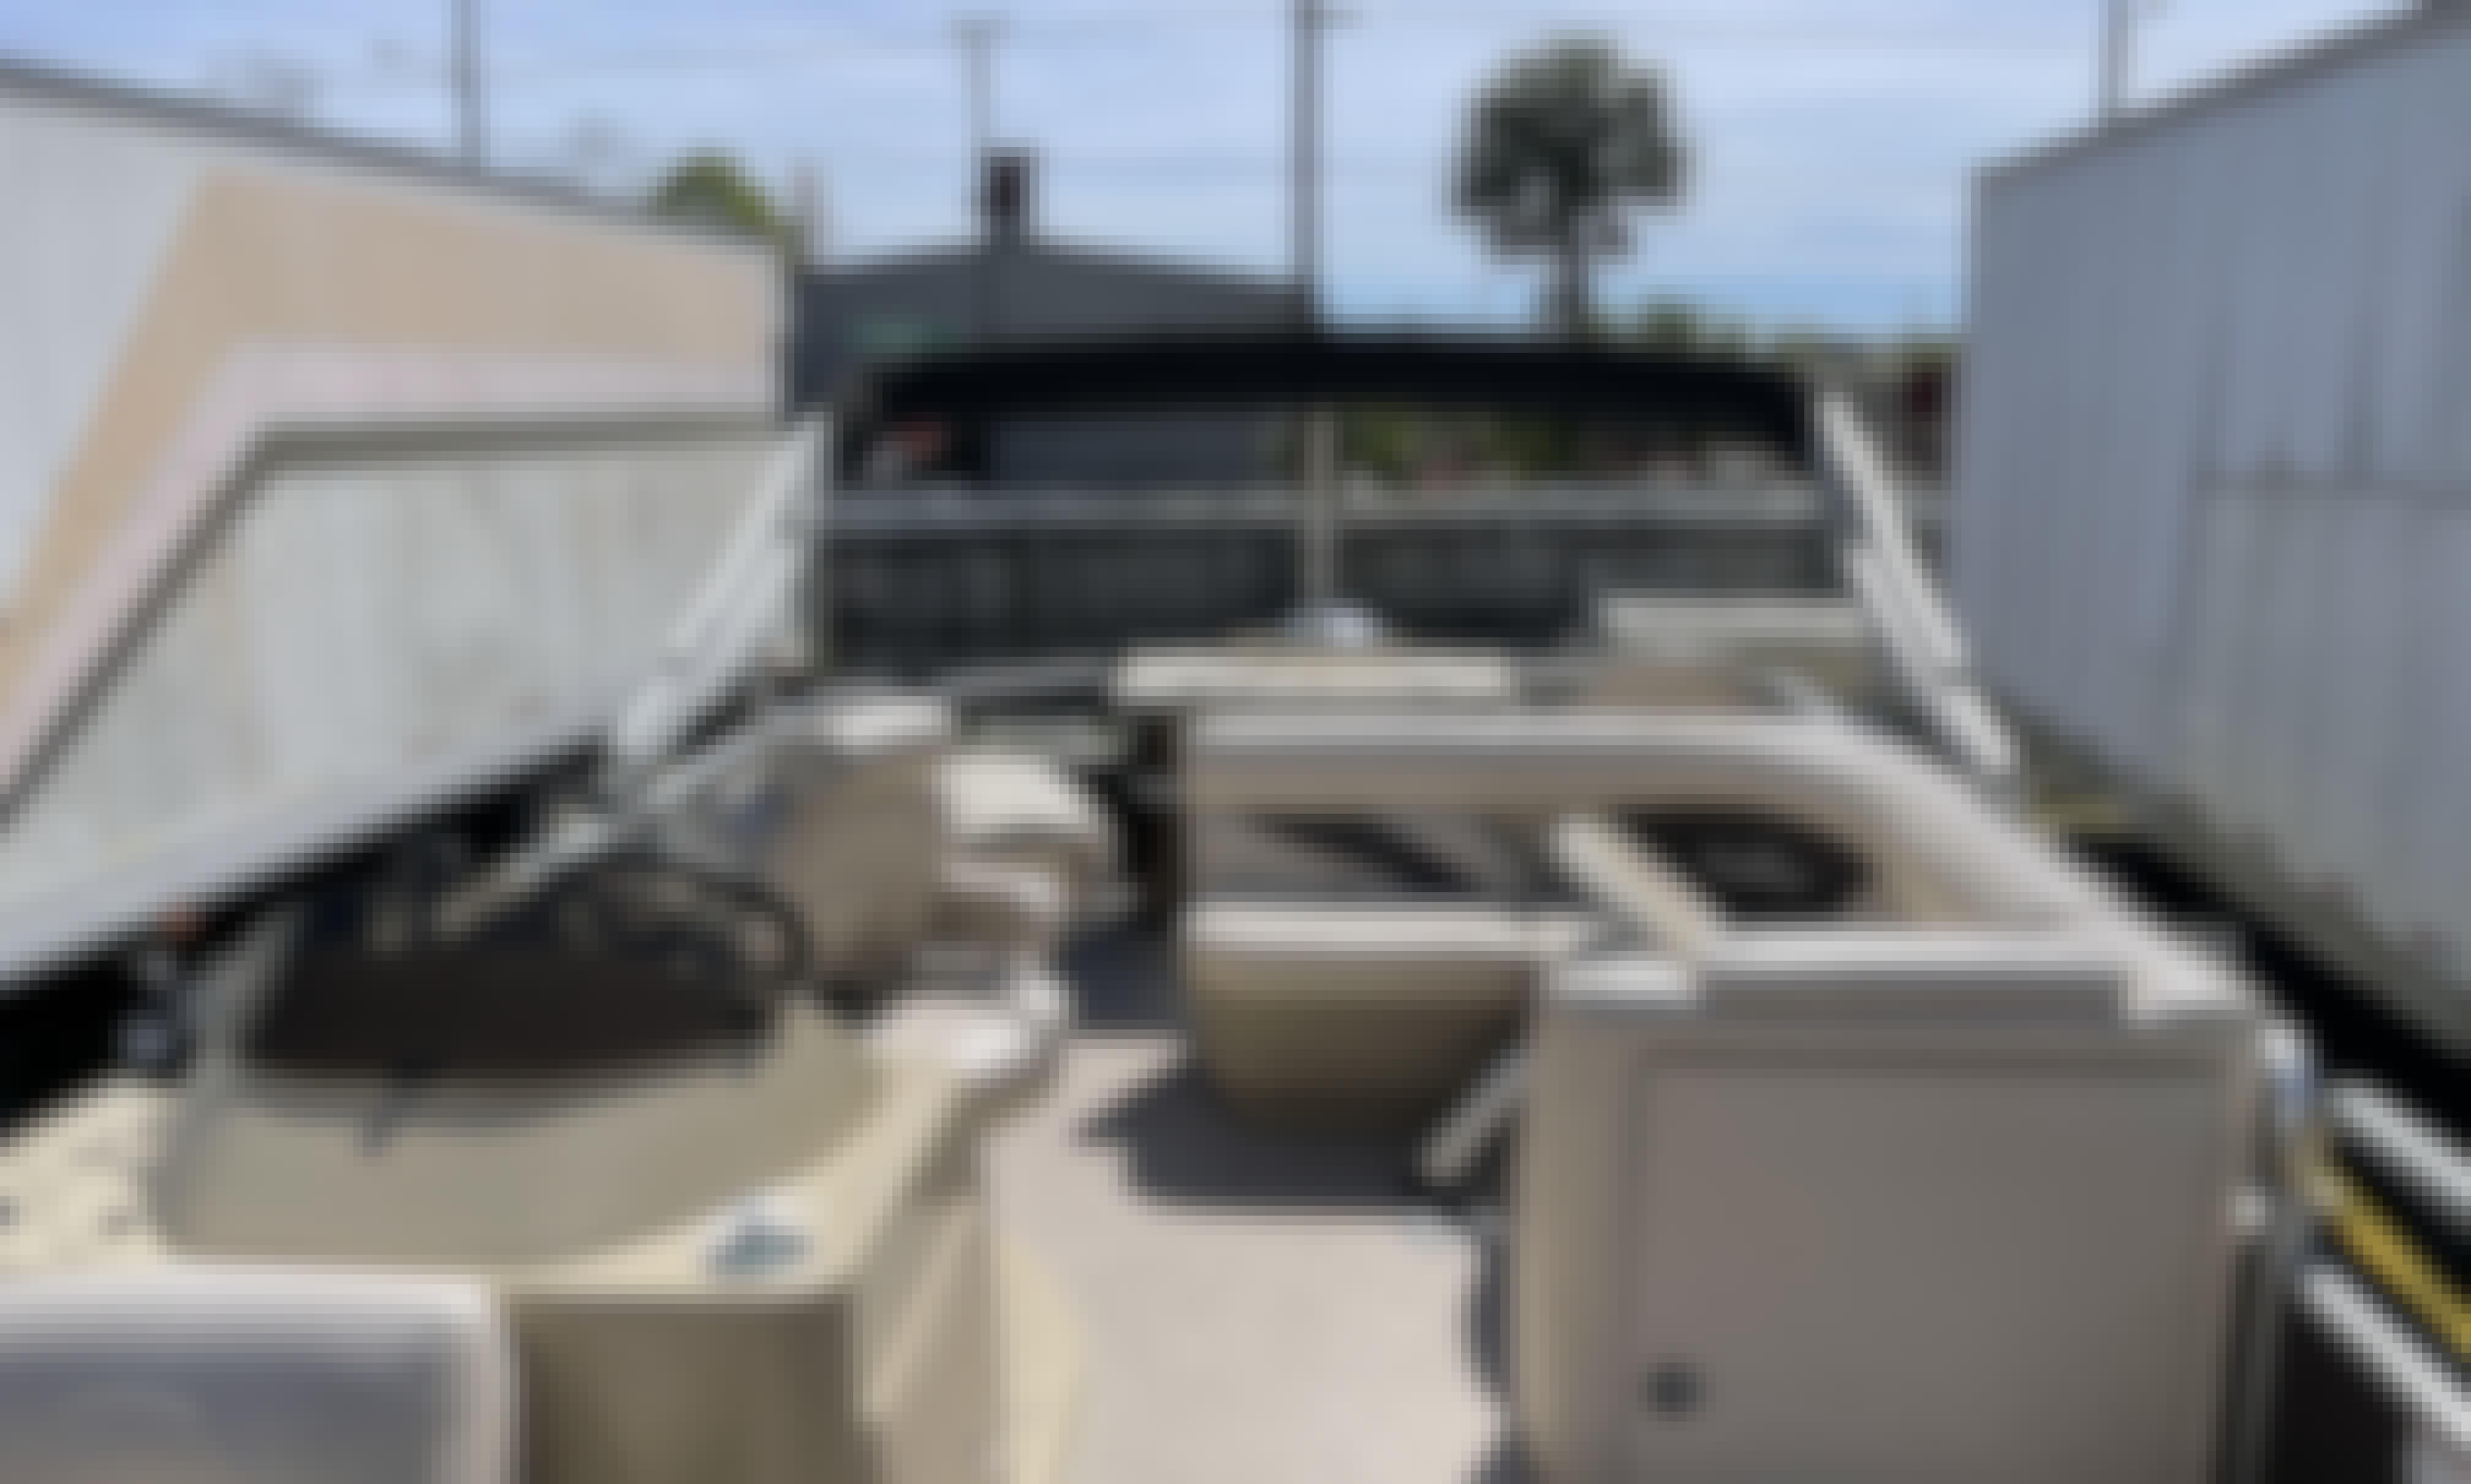 24' SunChaser Craft 8520 Classic Cruise-n-Fish Pontoon Rental in Tampa, Florida